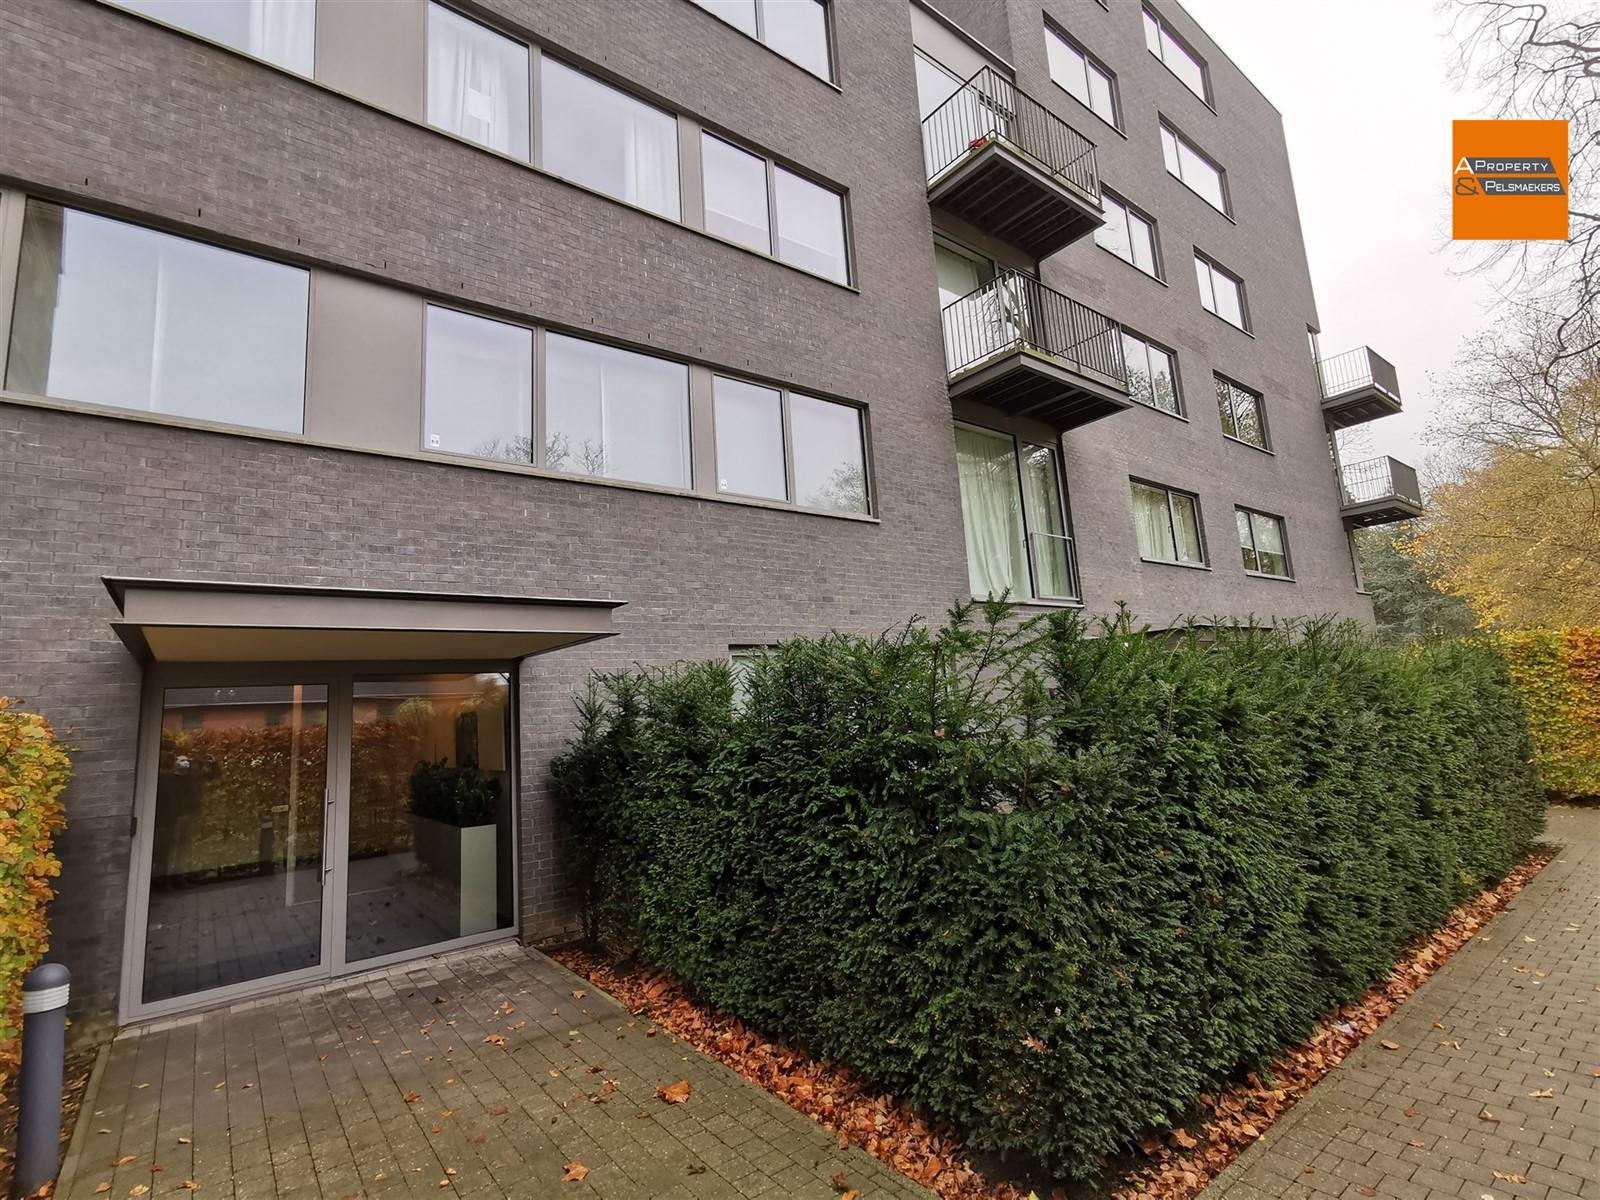 Foto 18 : Gemeubeld appartement in 1050 ELSENE (België) - Prijs € 1.500